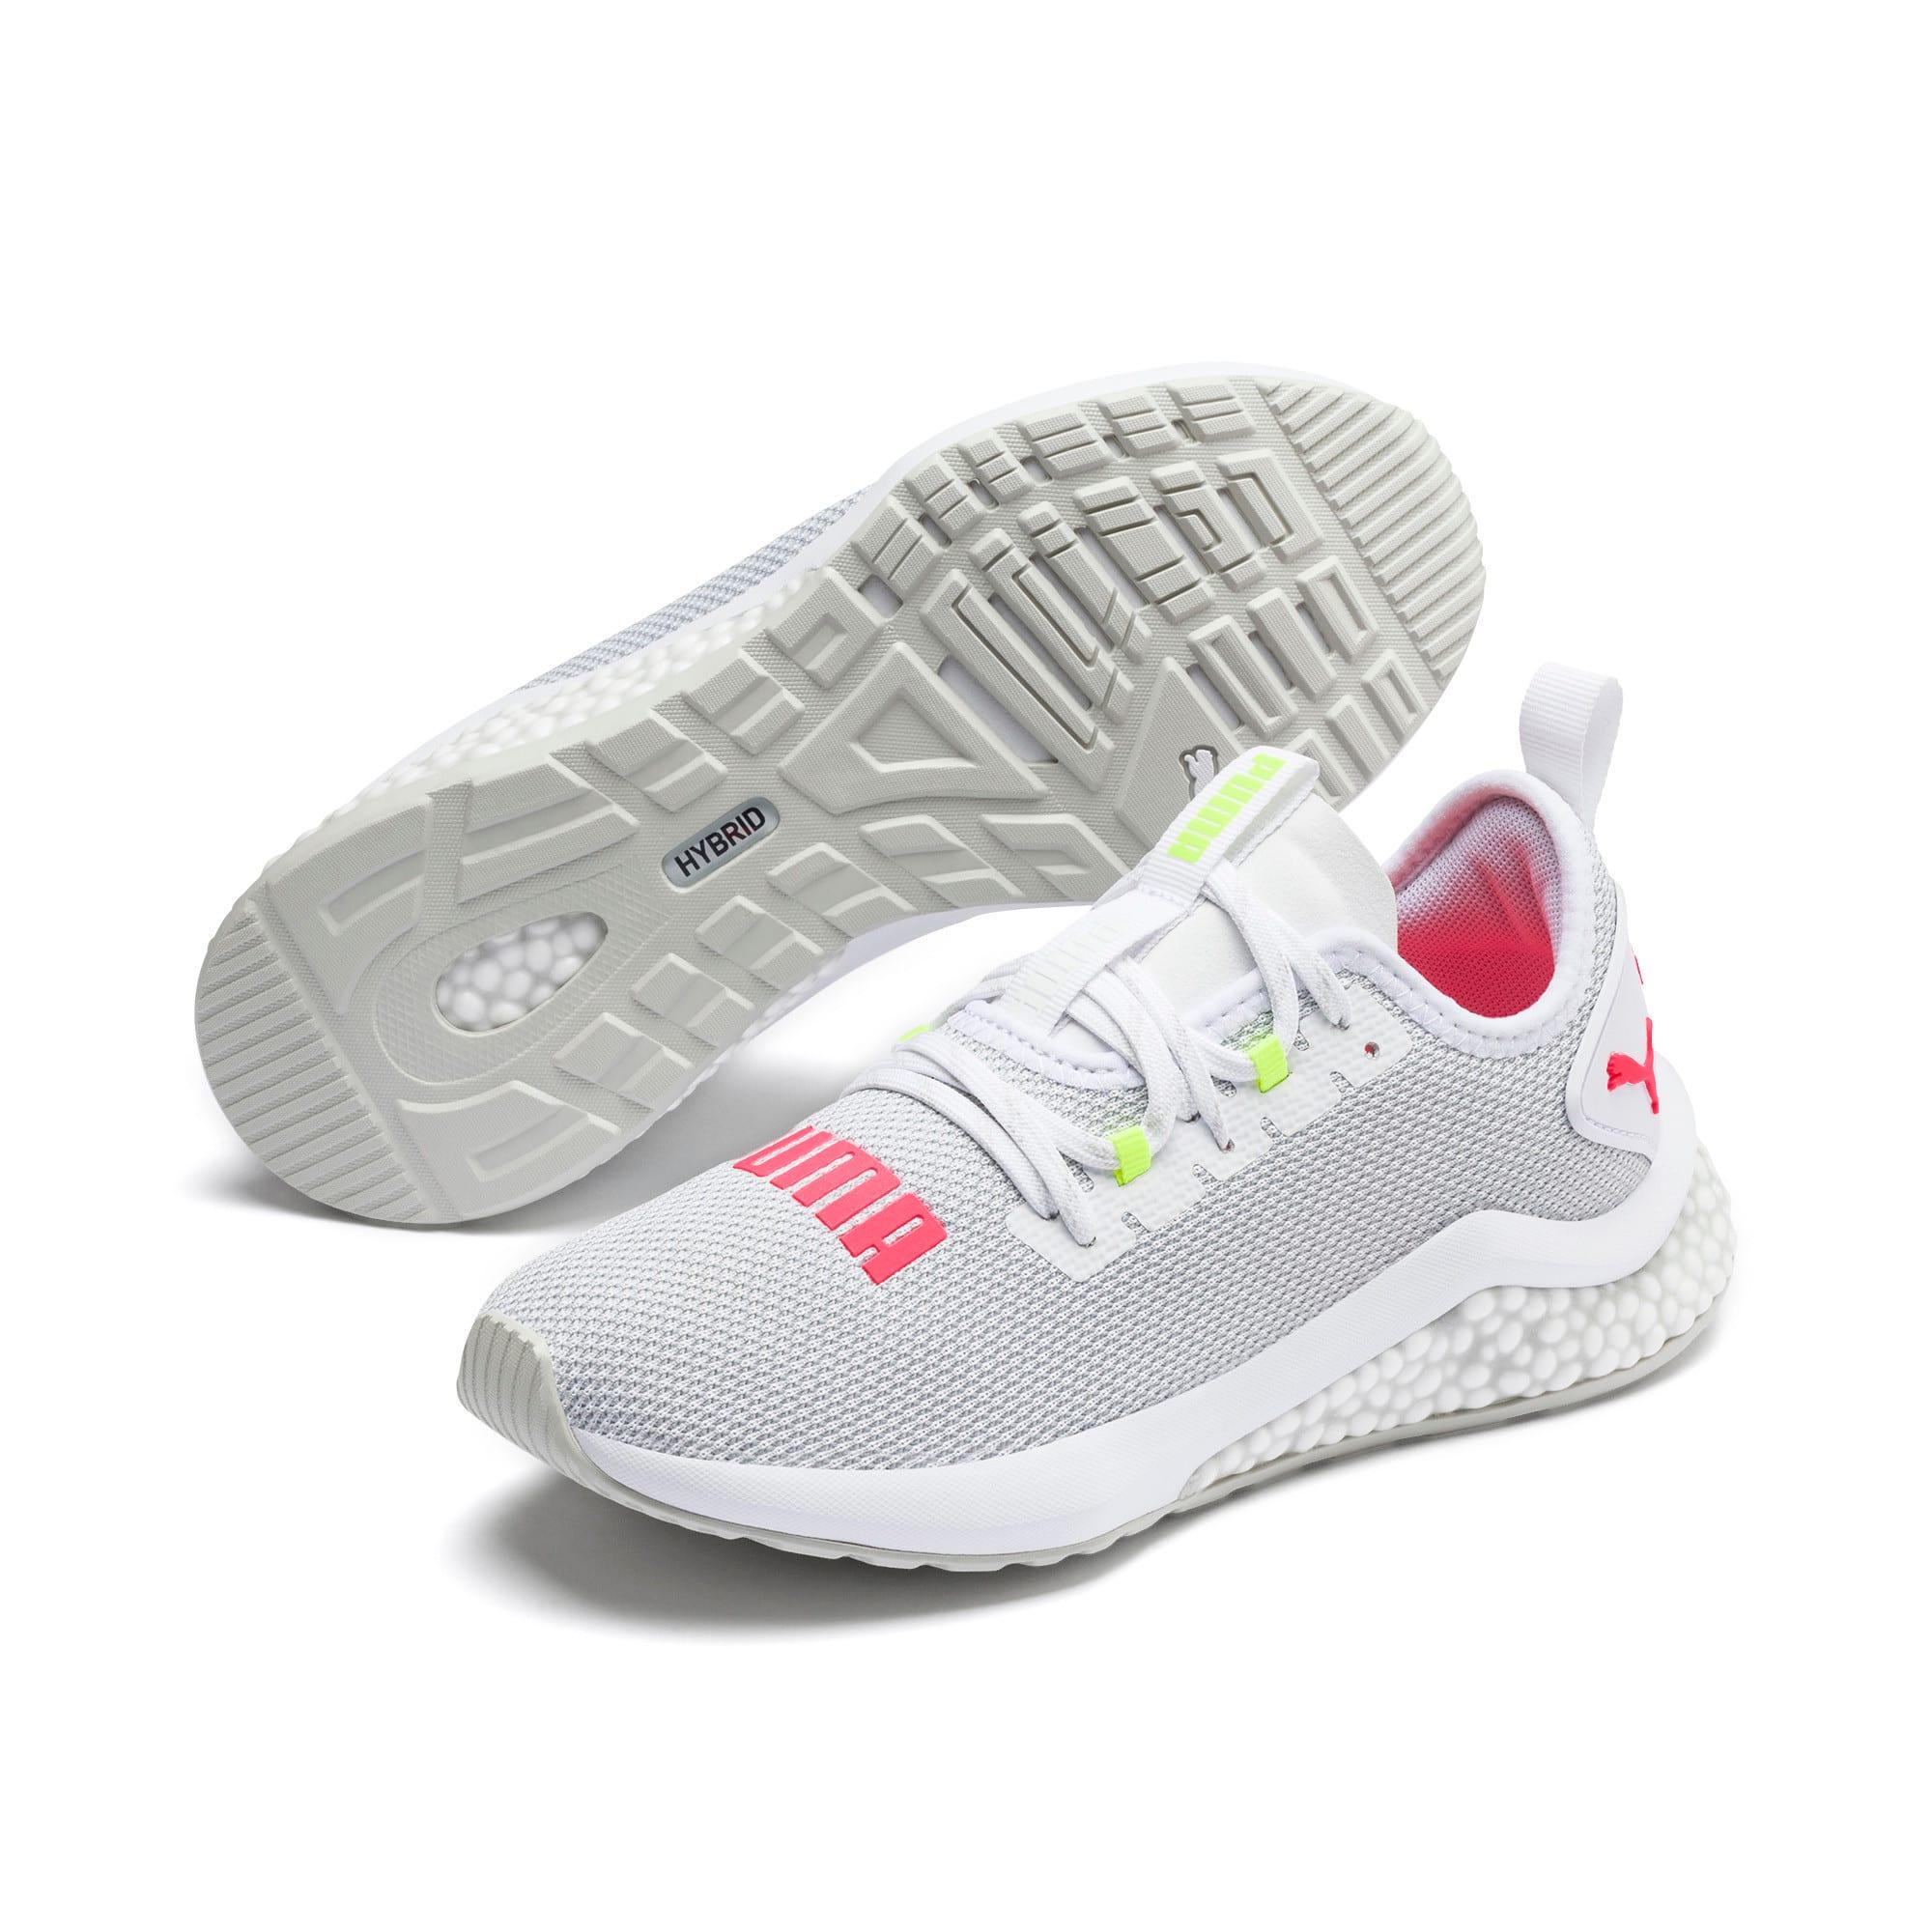 Thumbnail 3 of HYBRID NX Women's Running Shoes, Puma White-Pink Alert, medium